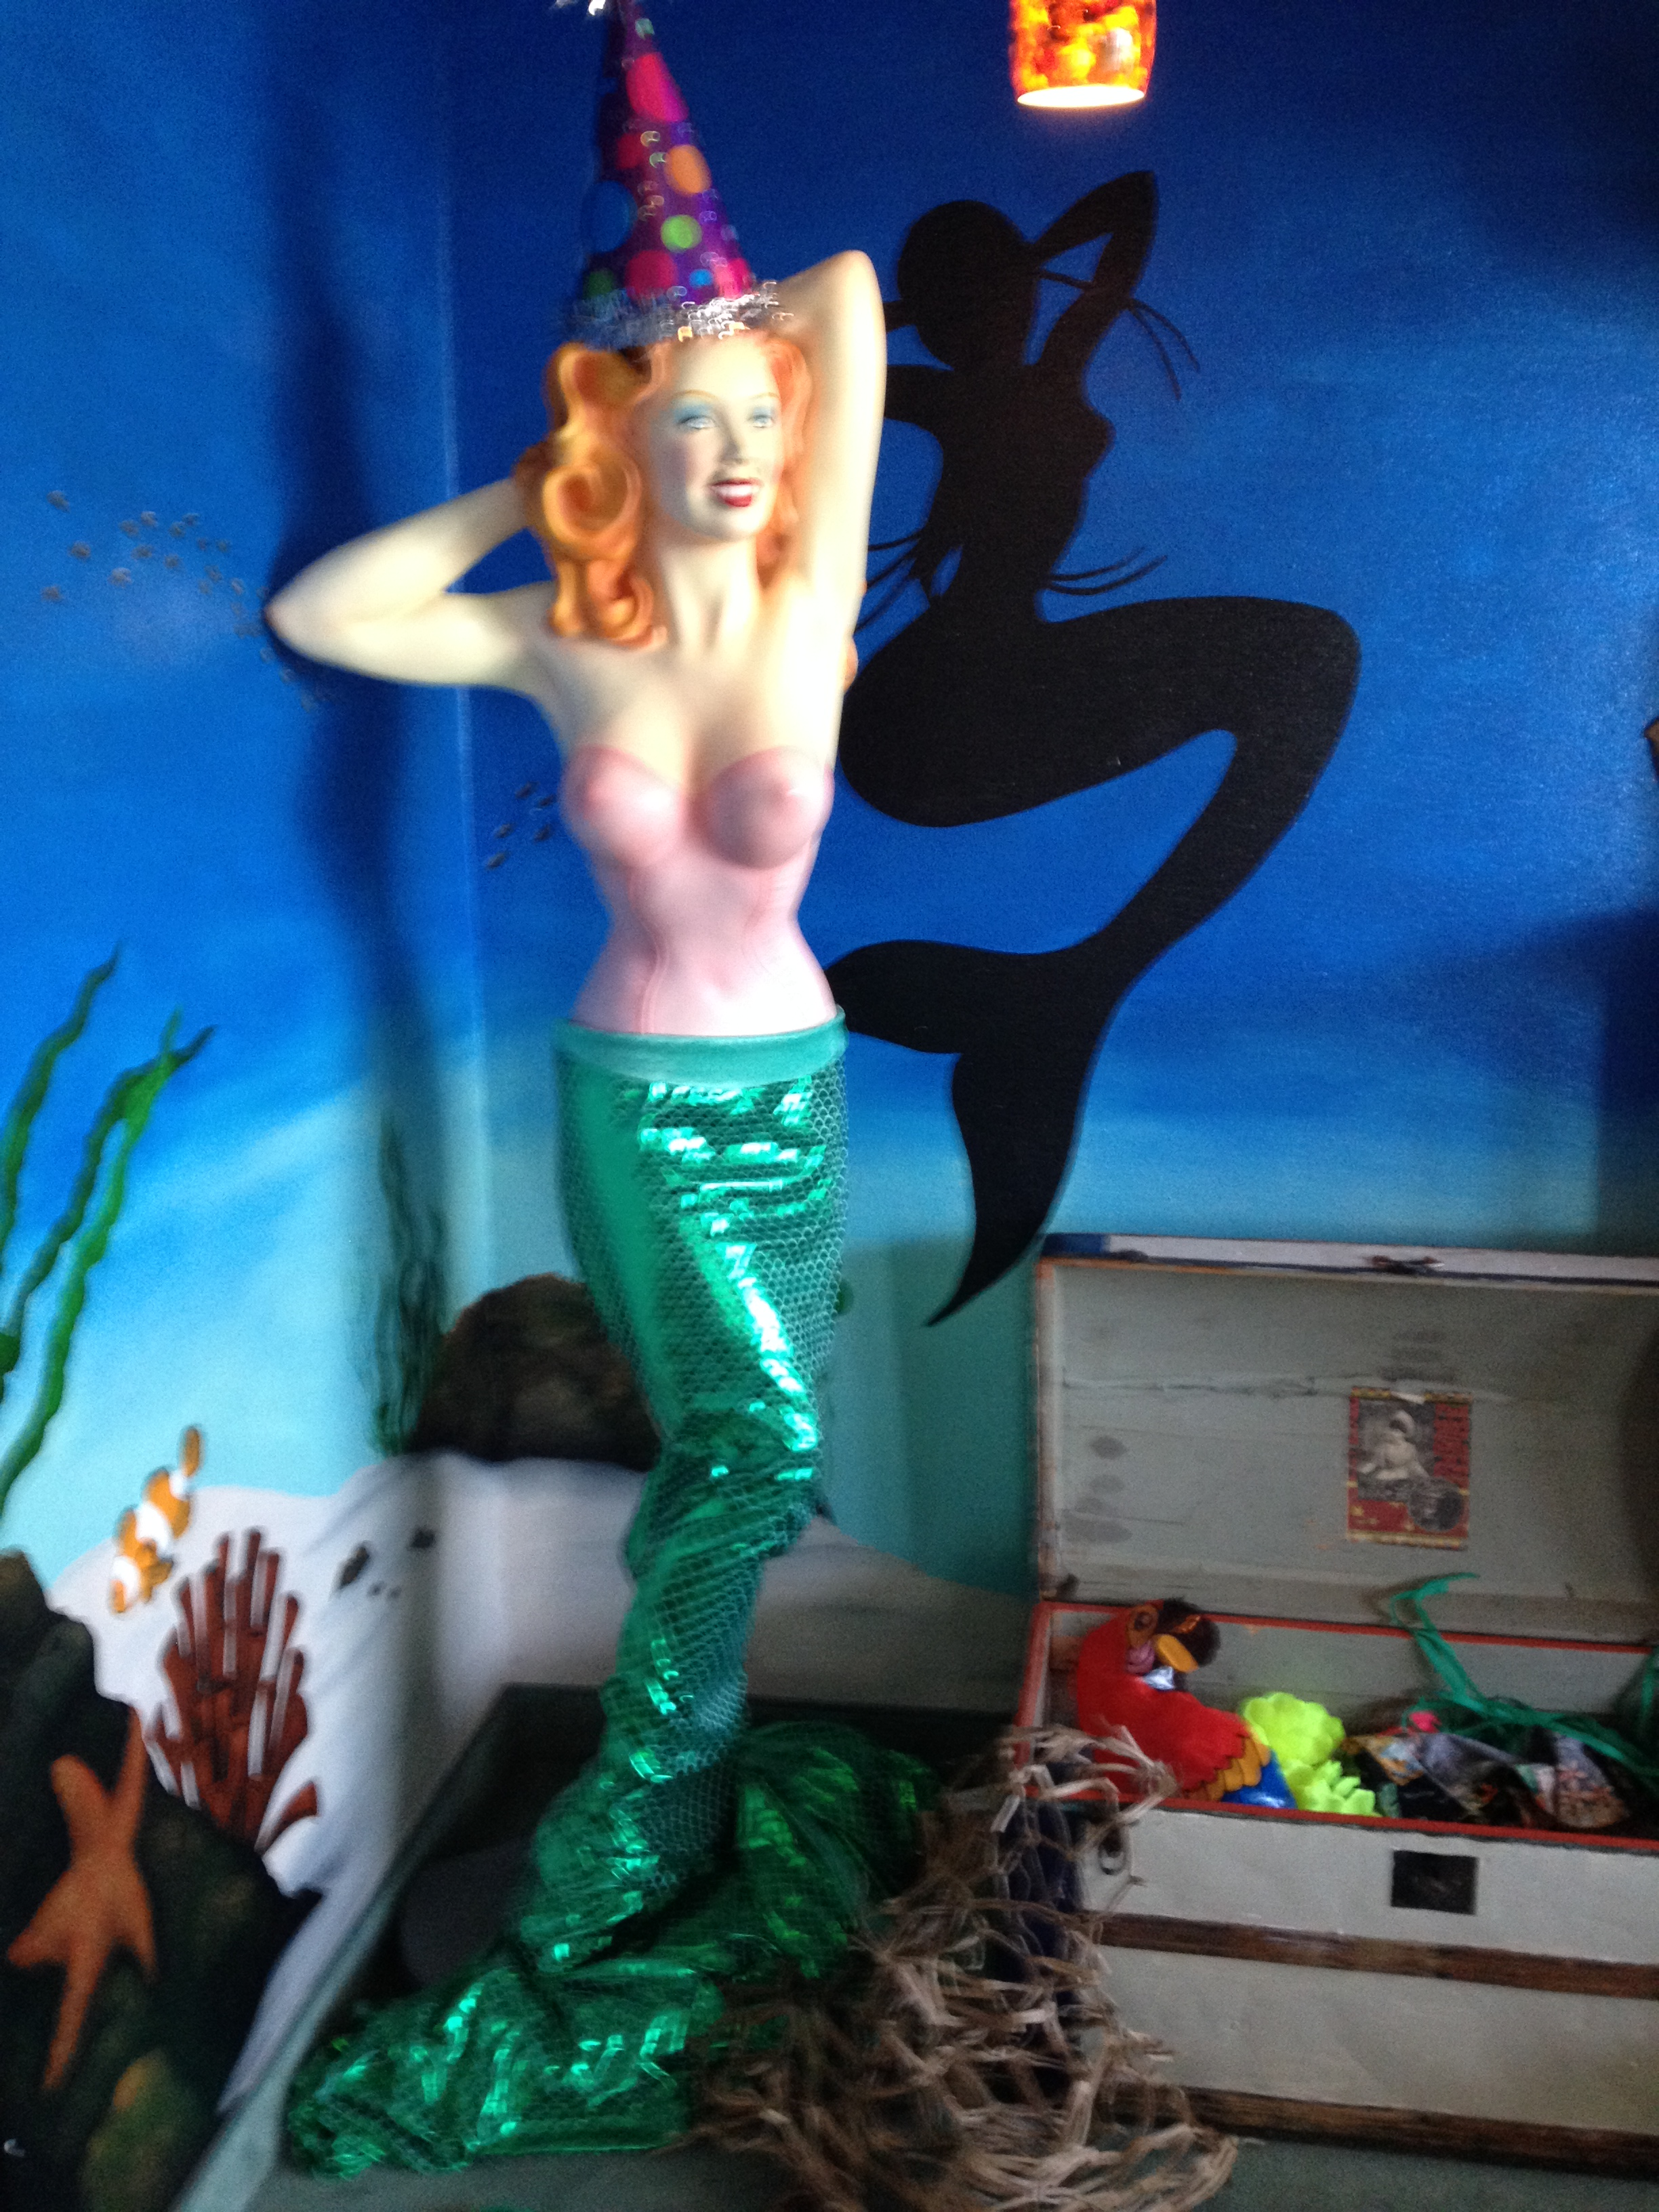 Coast Guard Video Of Mermaid